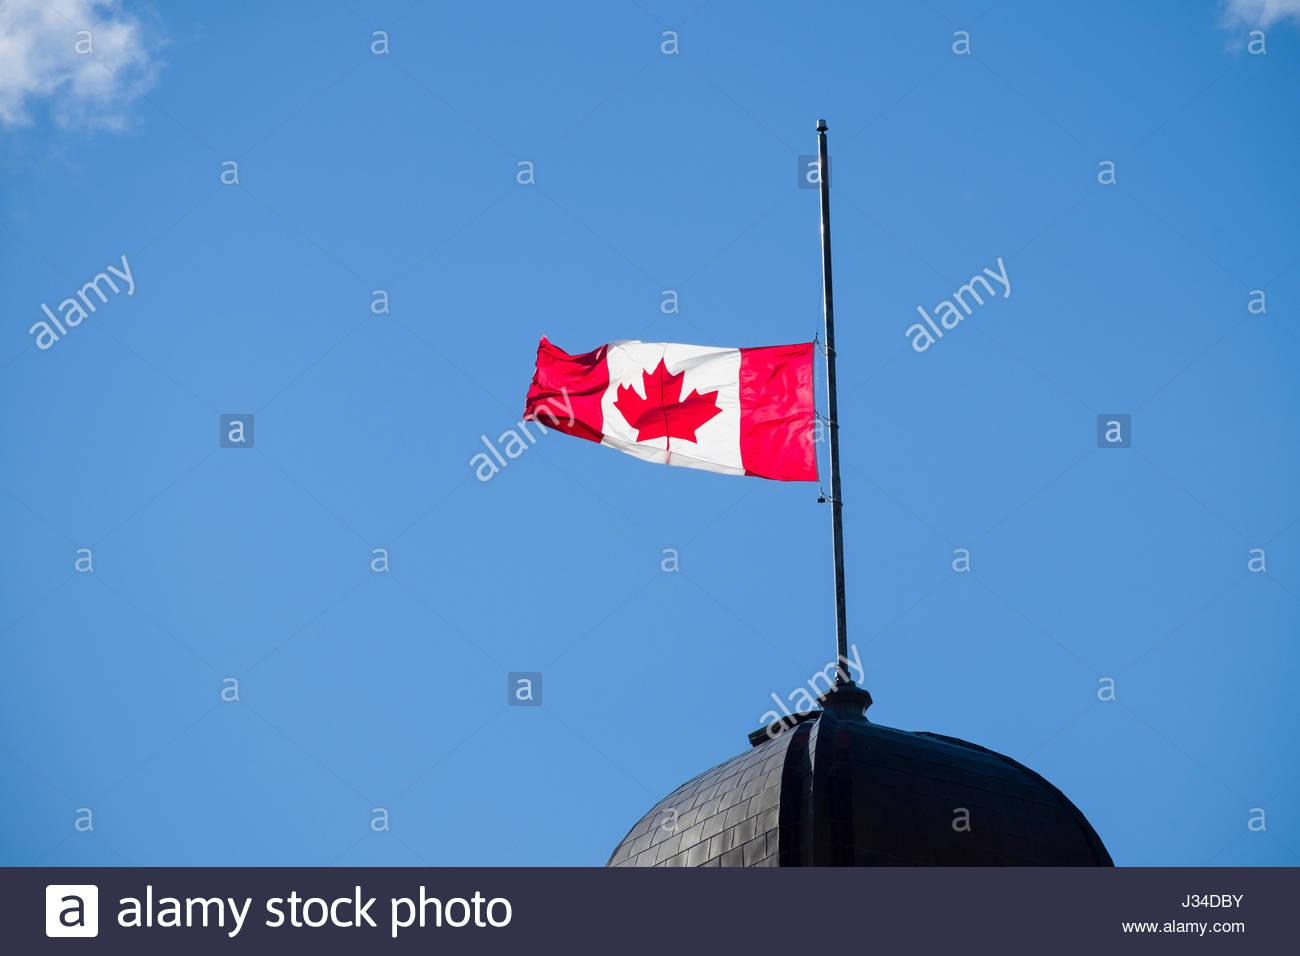 canadian flag half mast stock photos u0026 canadian flag half mast